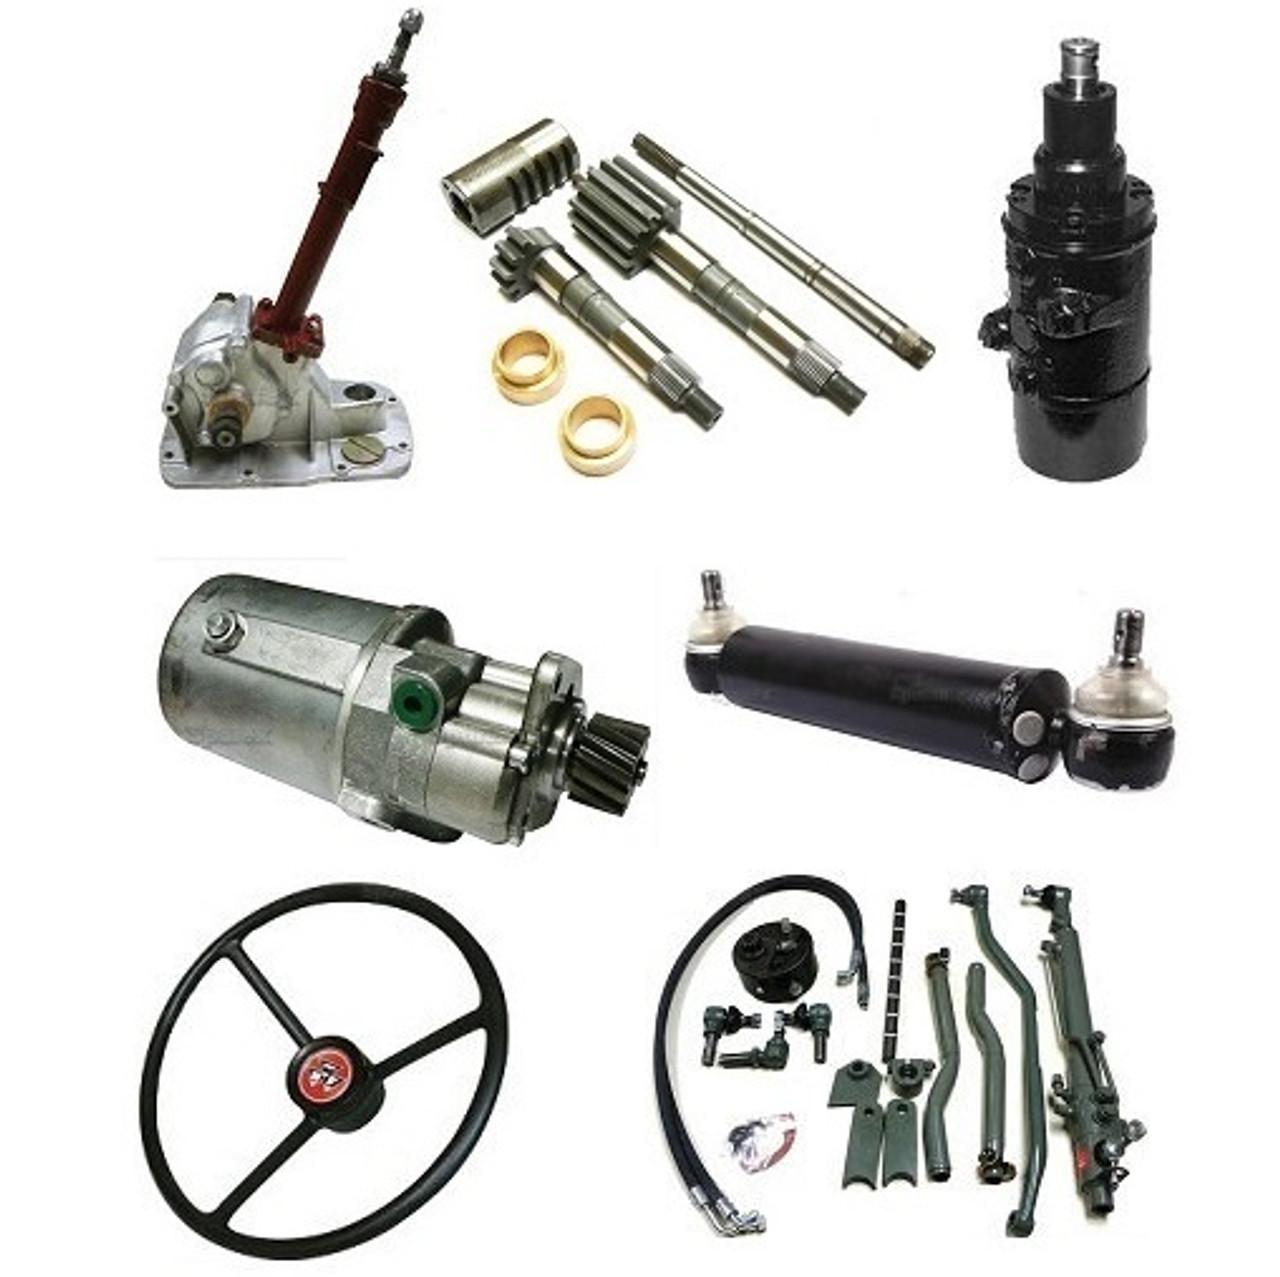 Massey Ferguson Tractor Parts | Massey Tractor Parts